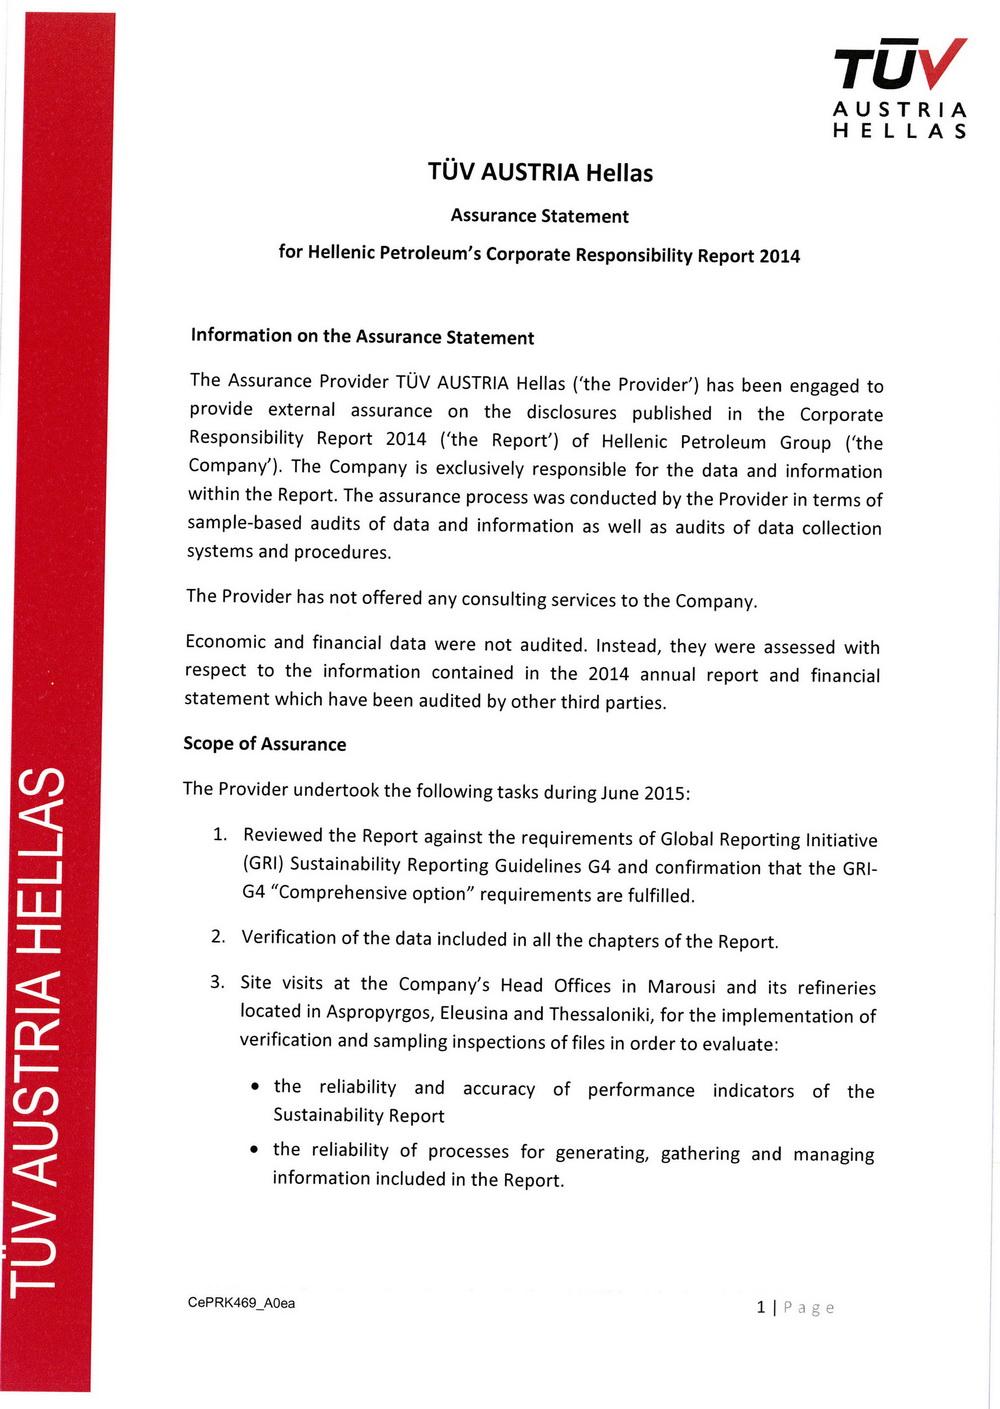 sustainabilityreport - Report\'s Certification